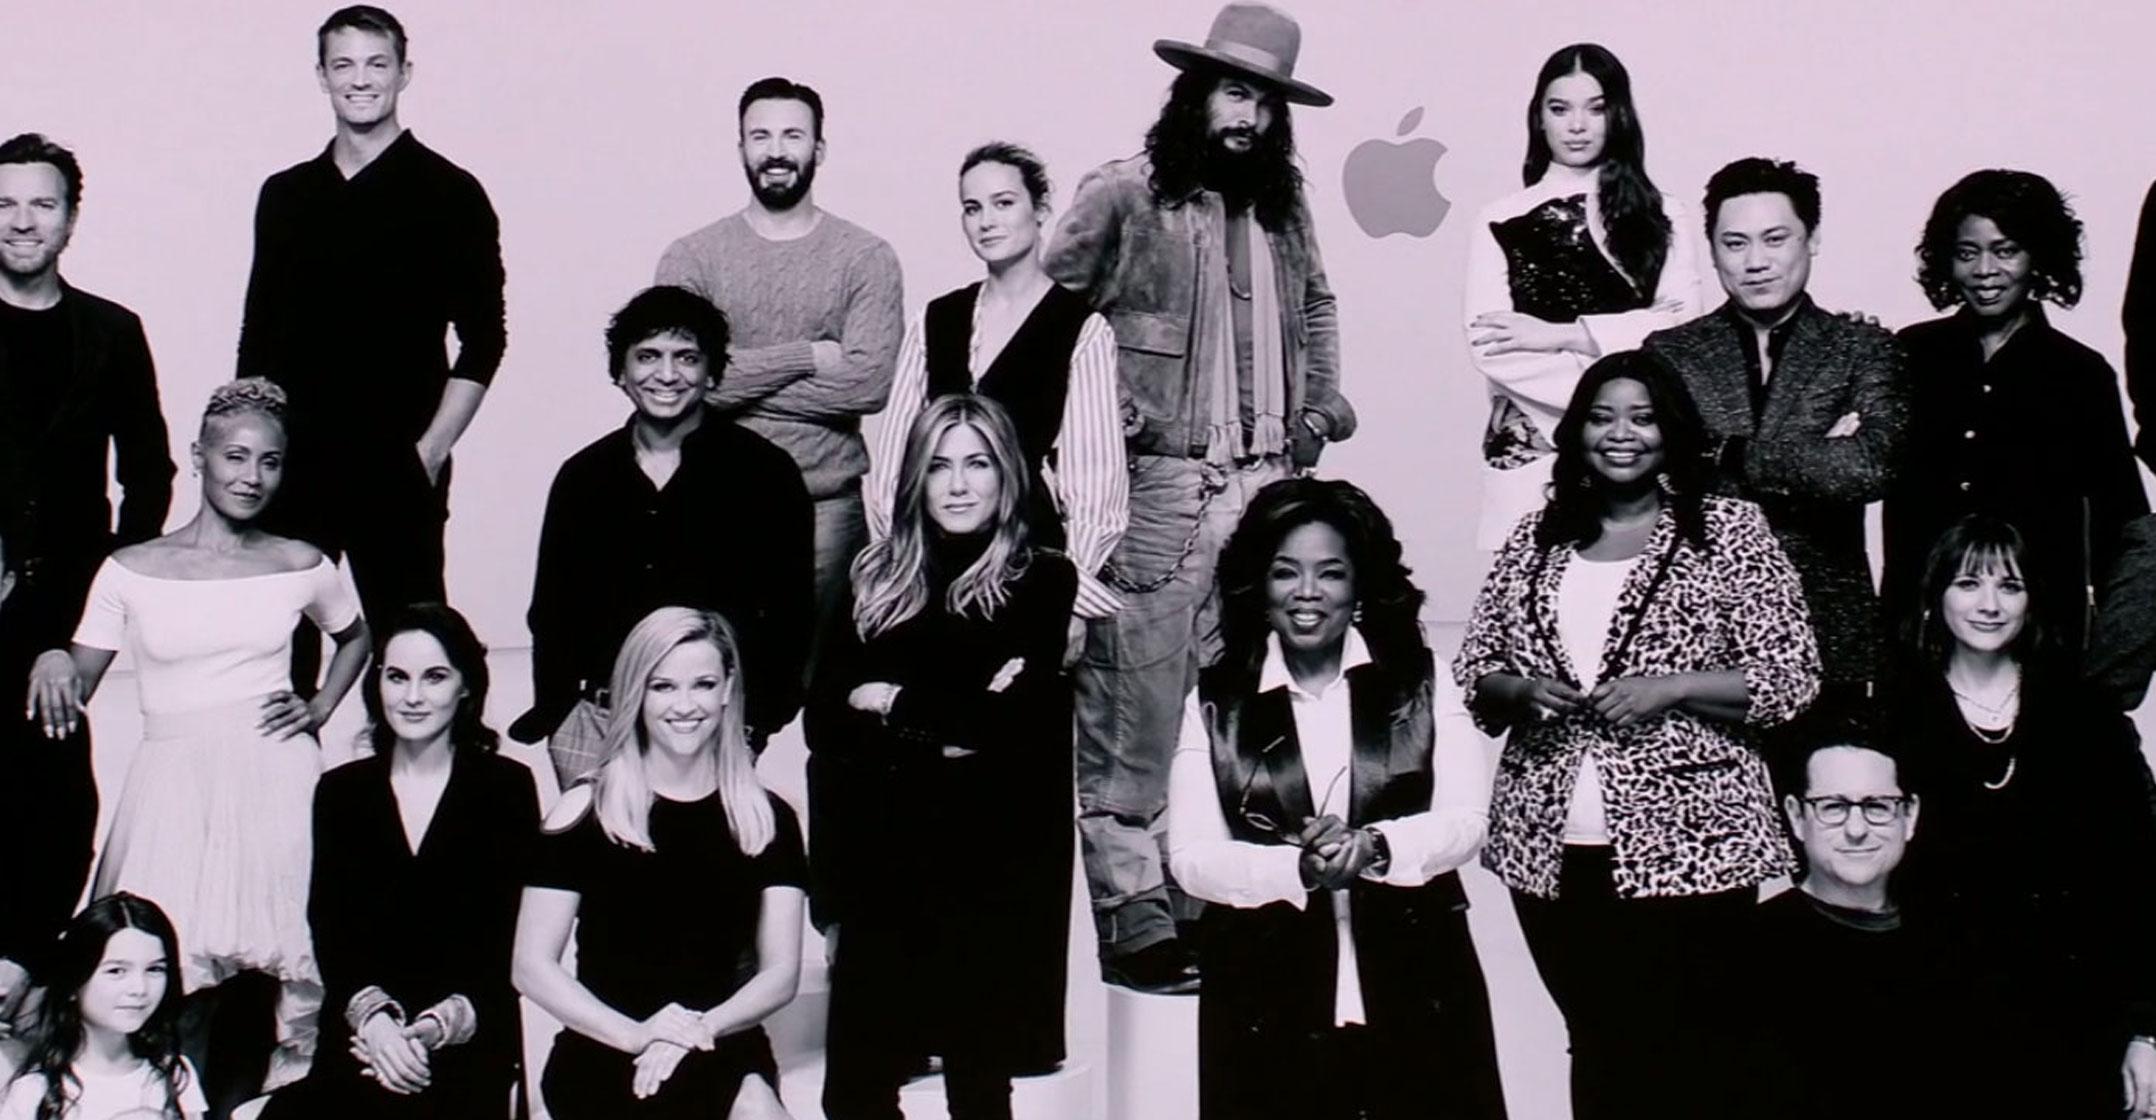 pa-apple-services-2156-1120.jpg